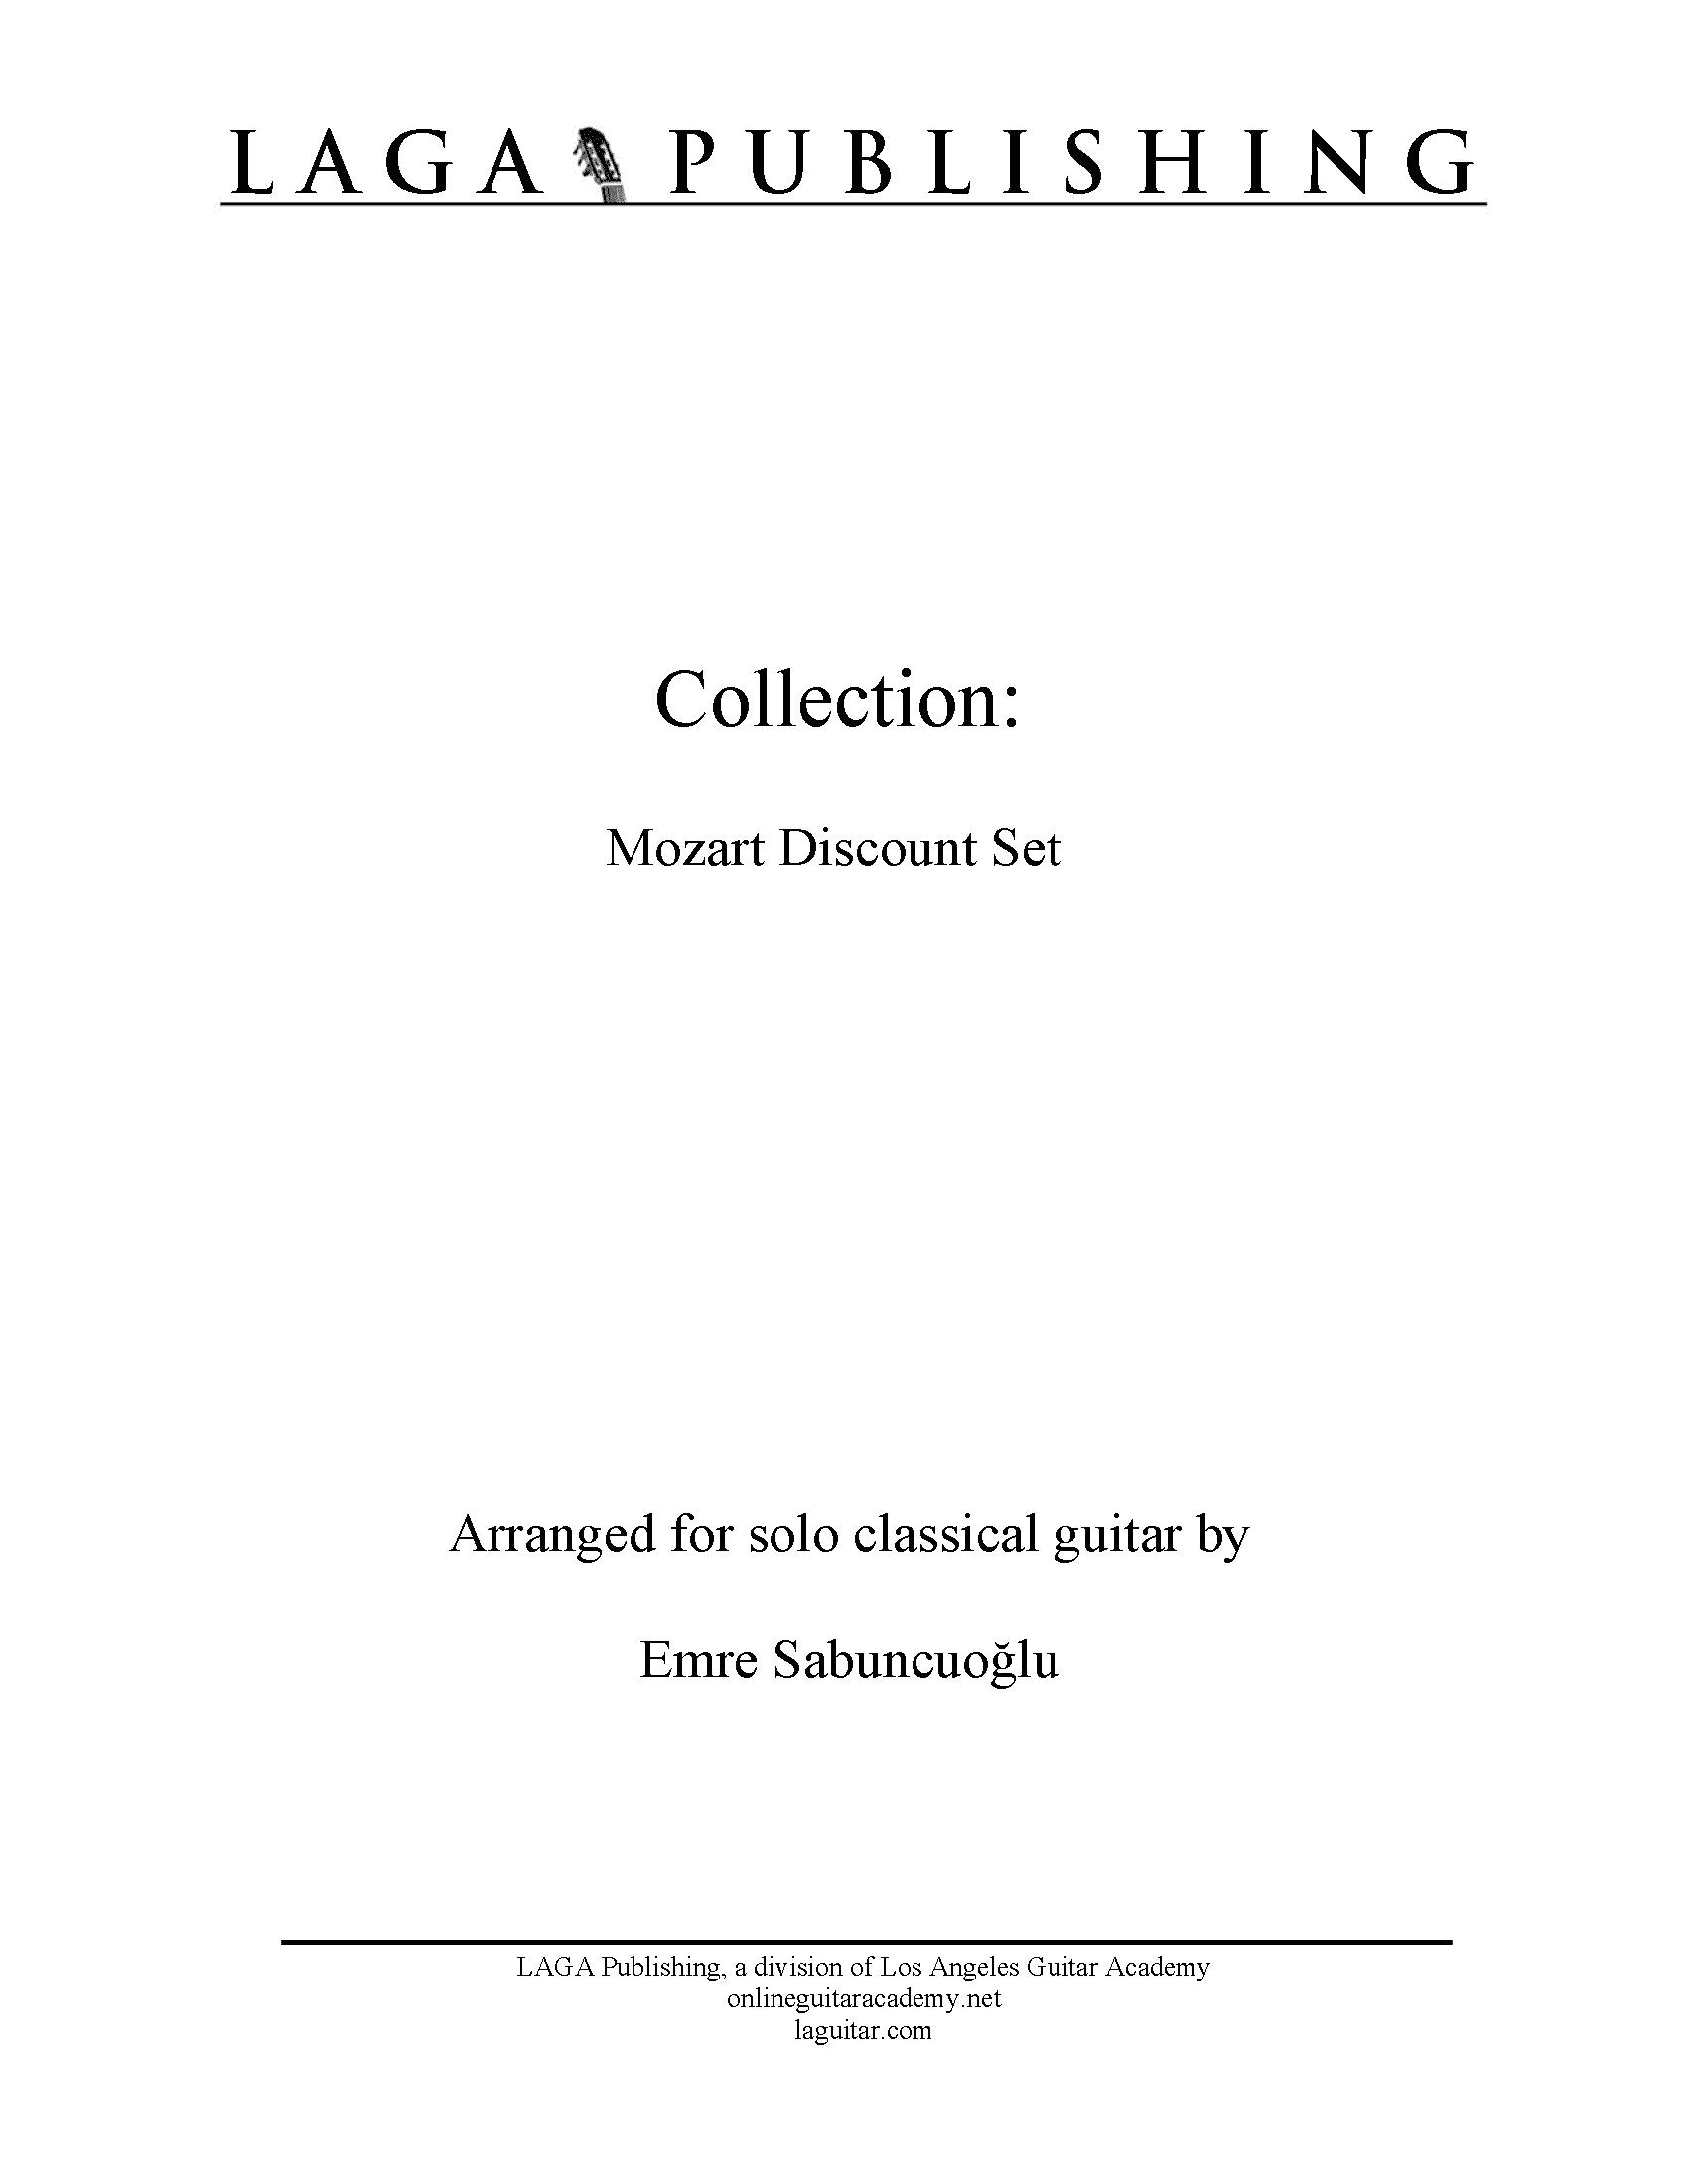 Collection: Mozart Discount Set